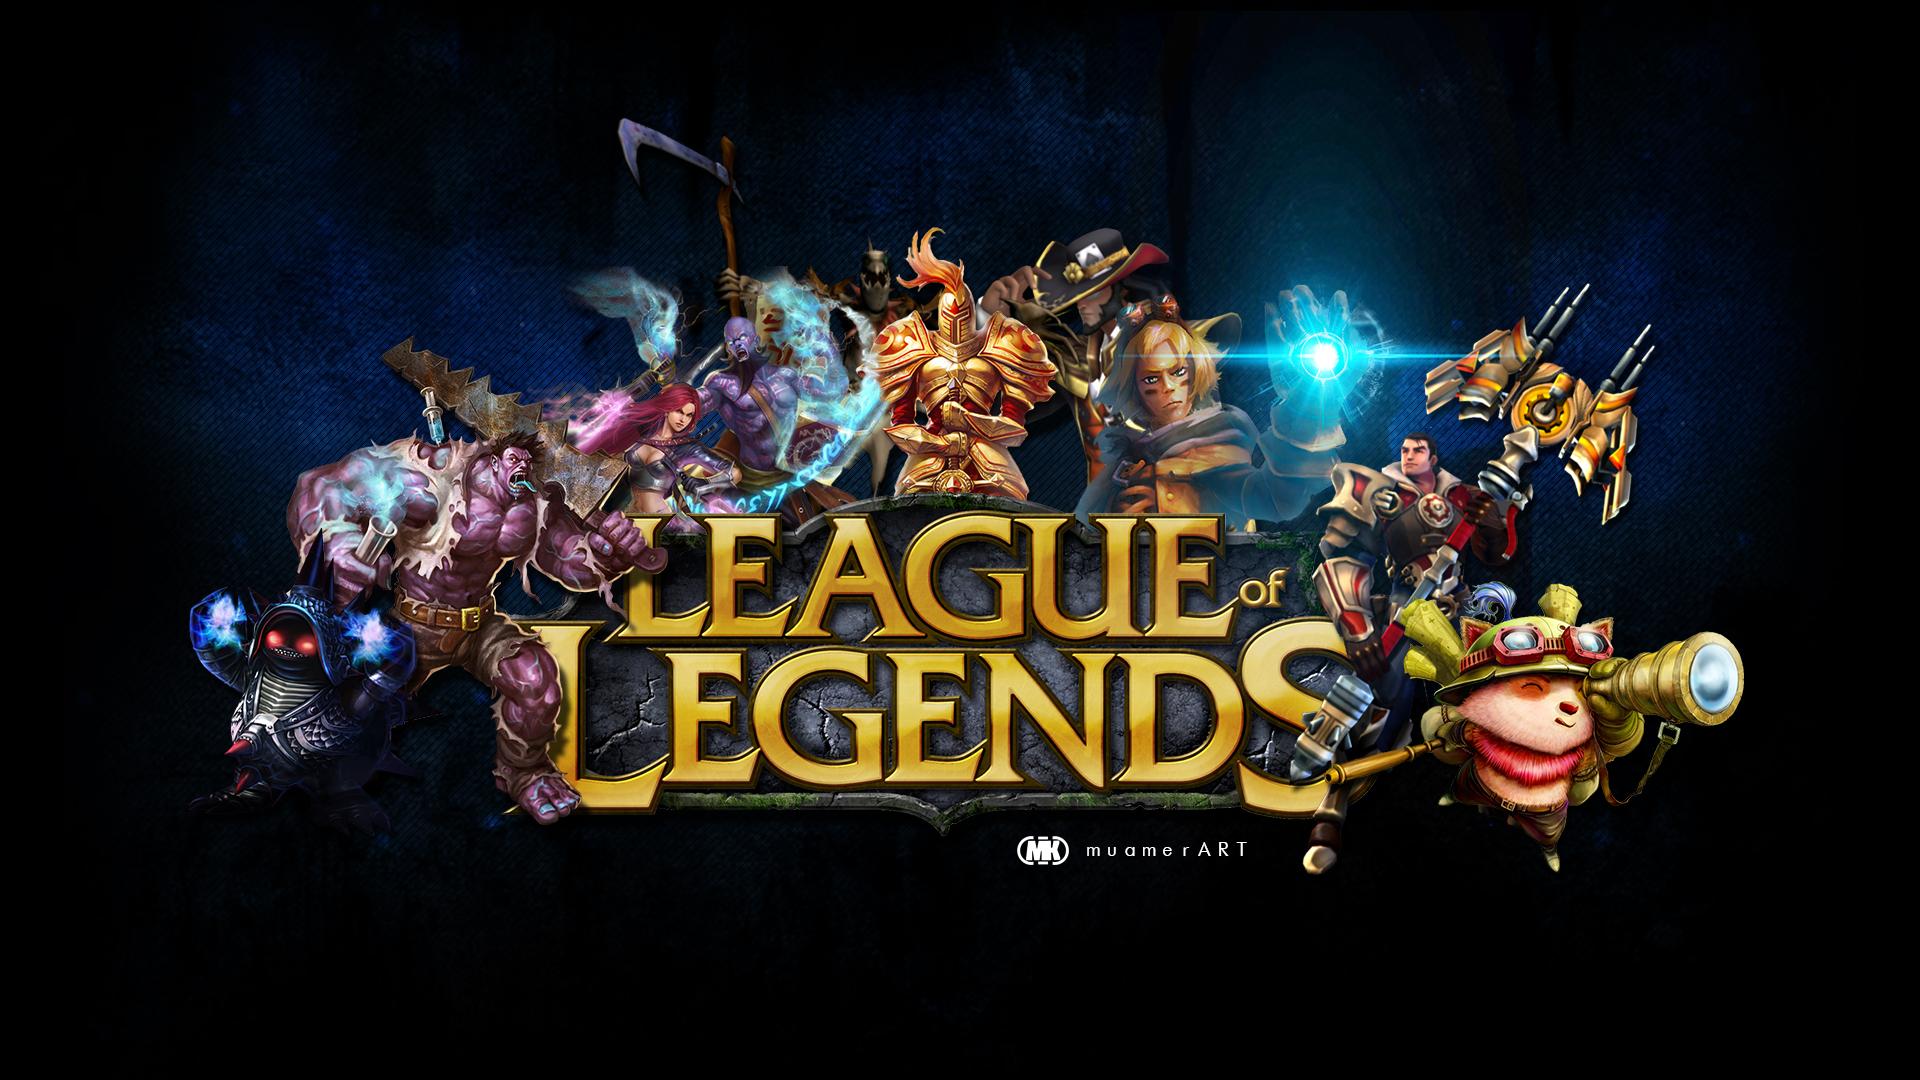 Volibear League of Legends Wallpaper Volibear Desktop Wallpaper